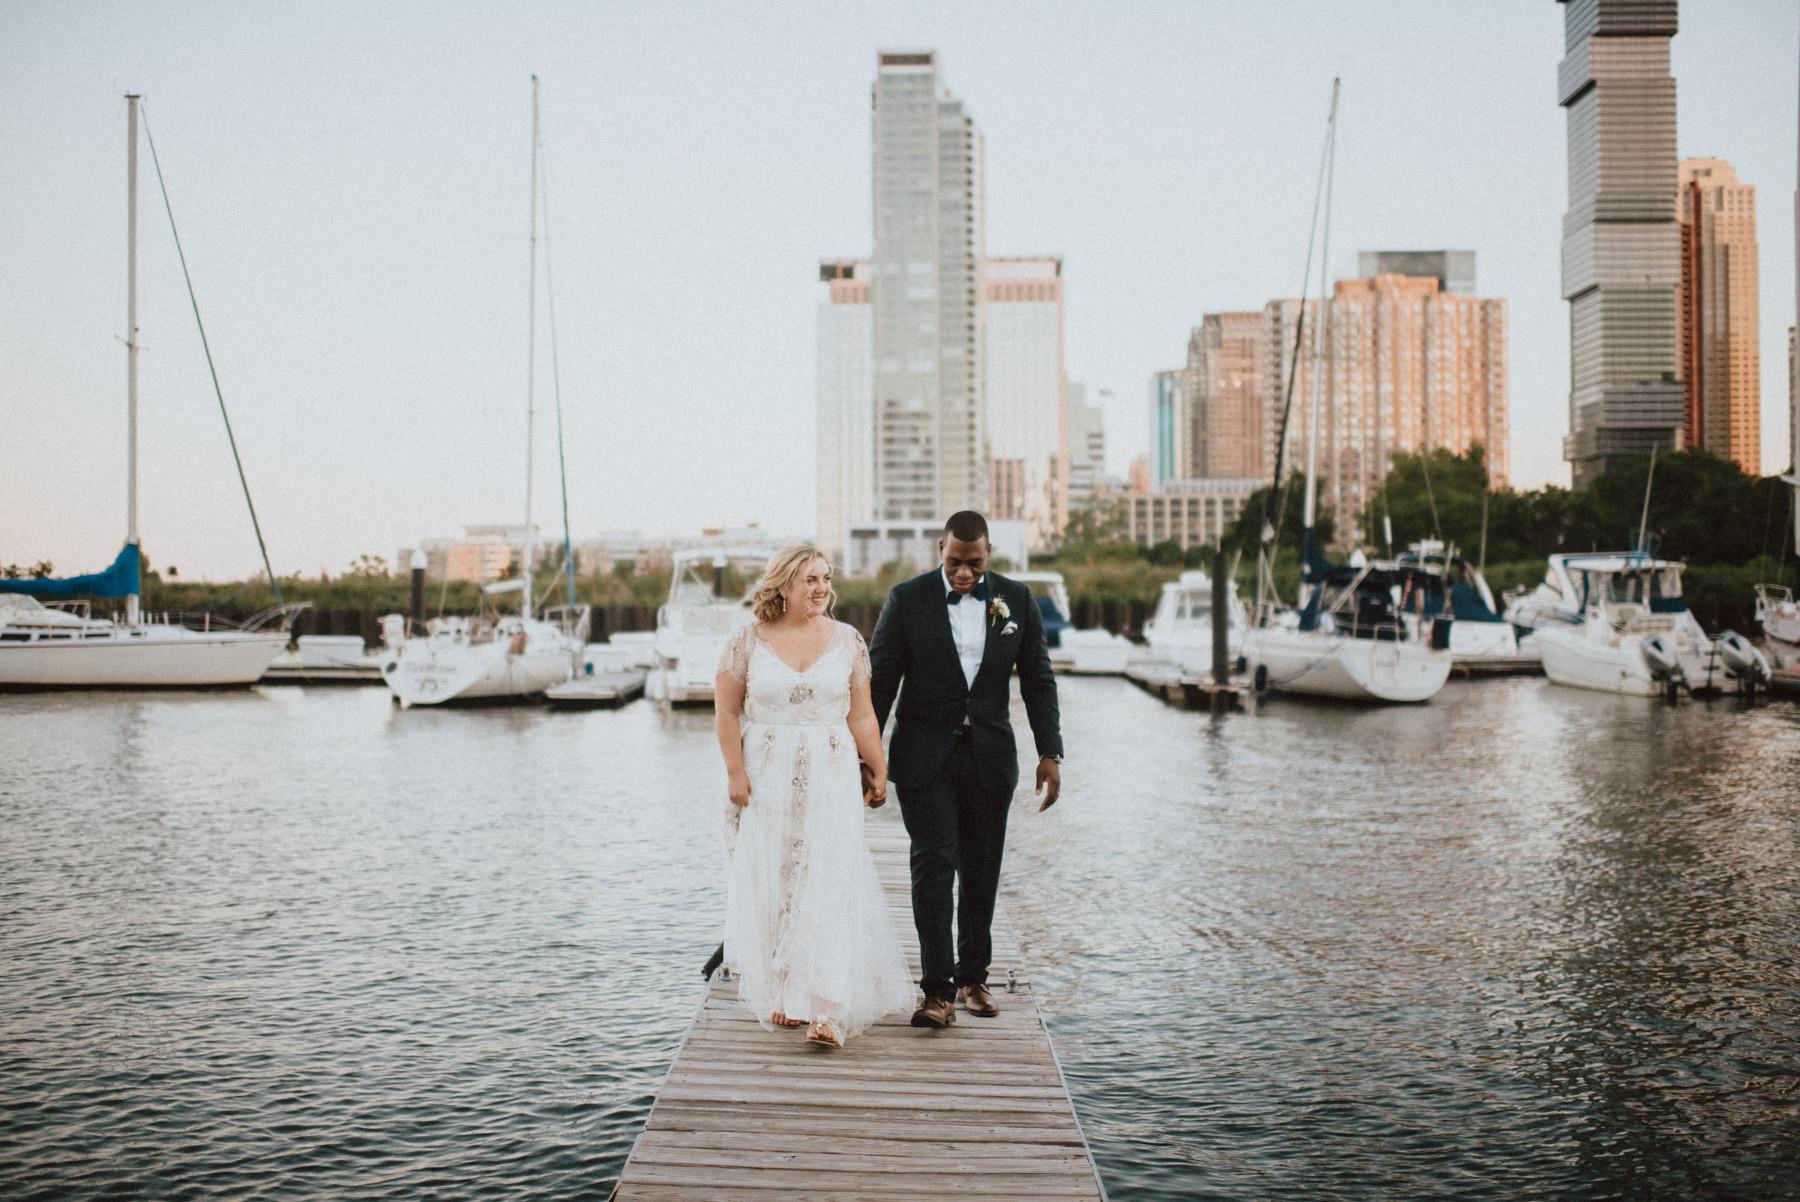 210-jersey-city-wedding-13.jpg